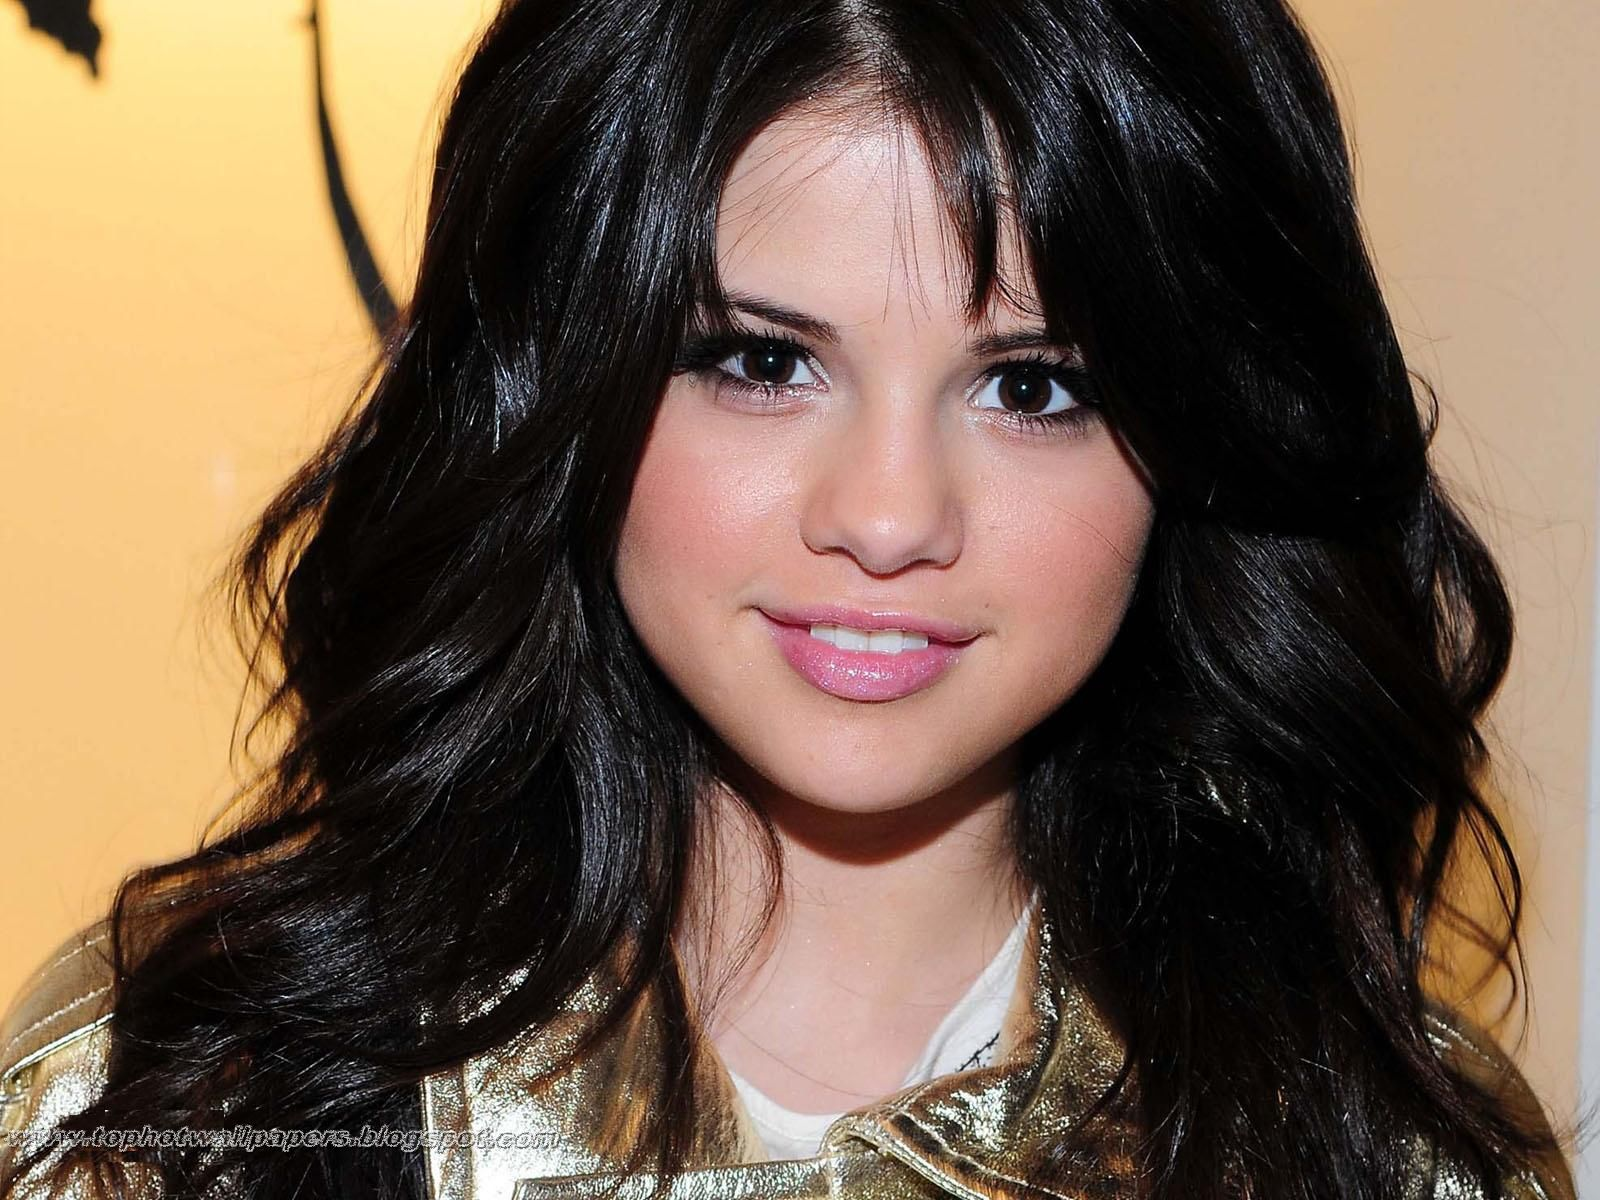 Selena Gomez Wallpaper 1600x1200